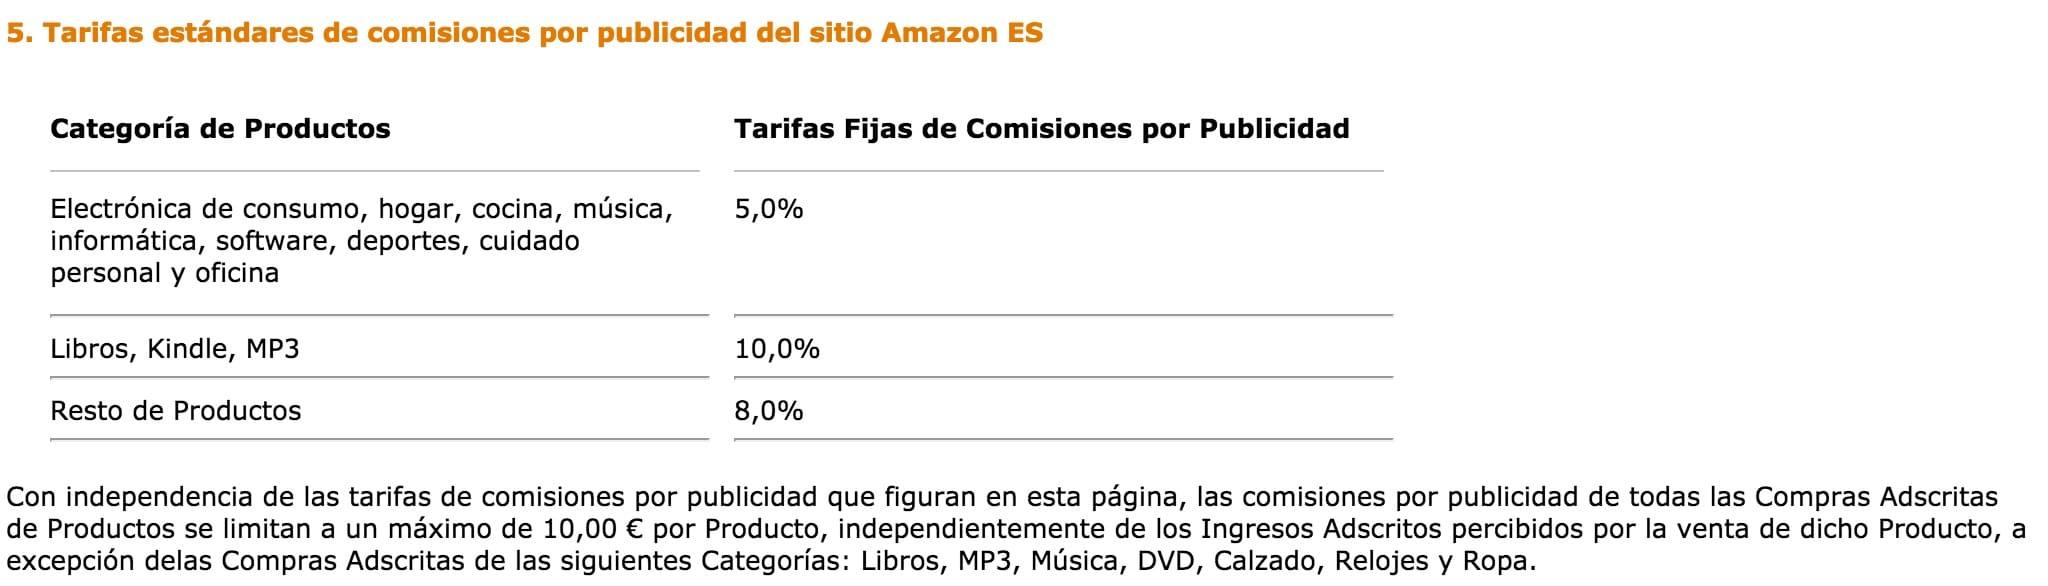 comisiones Amazon España